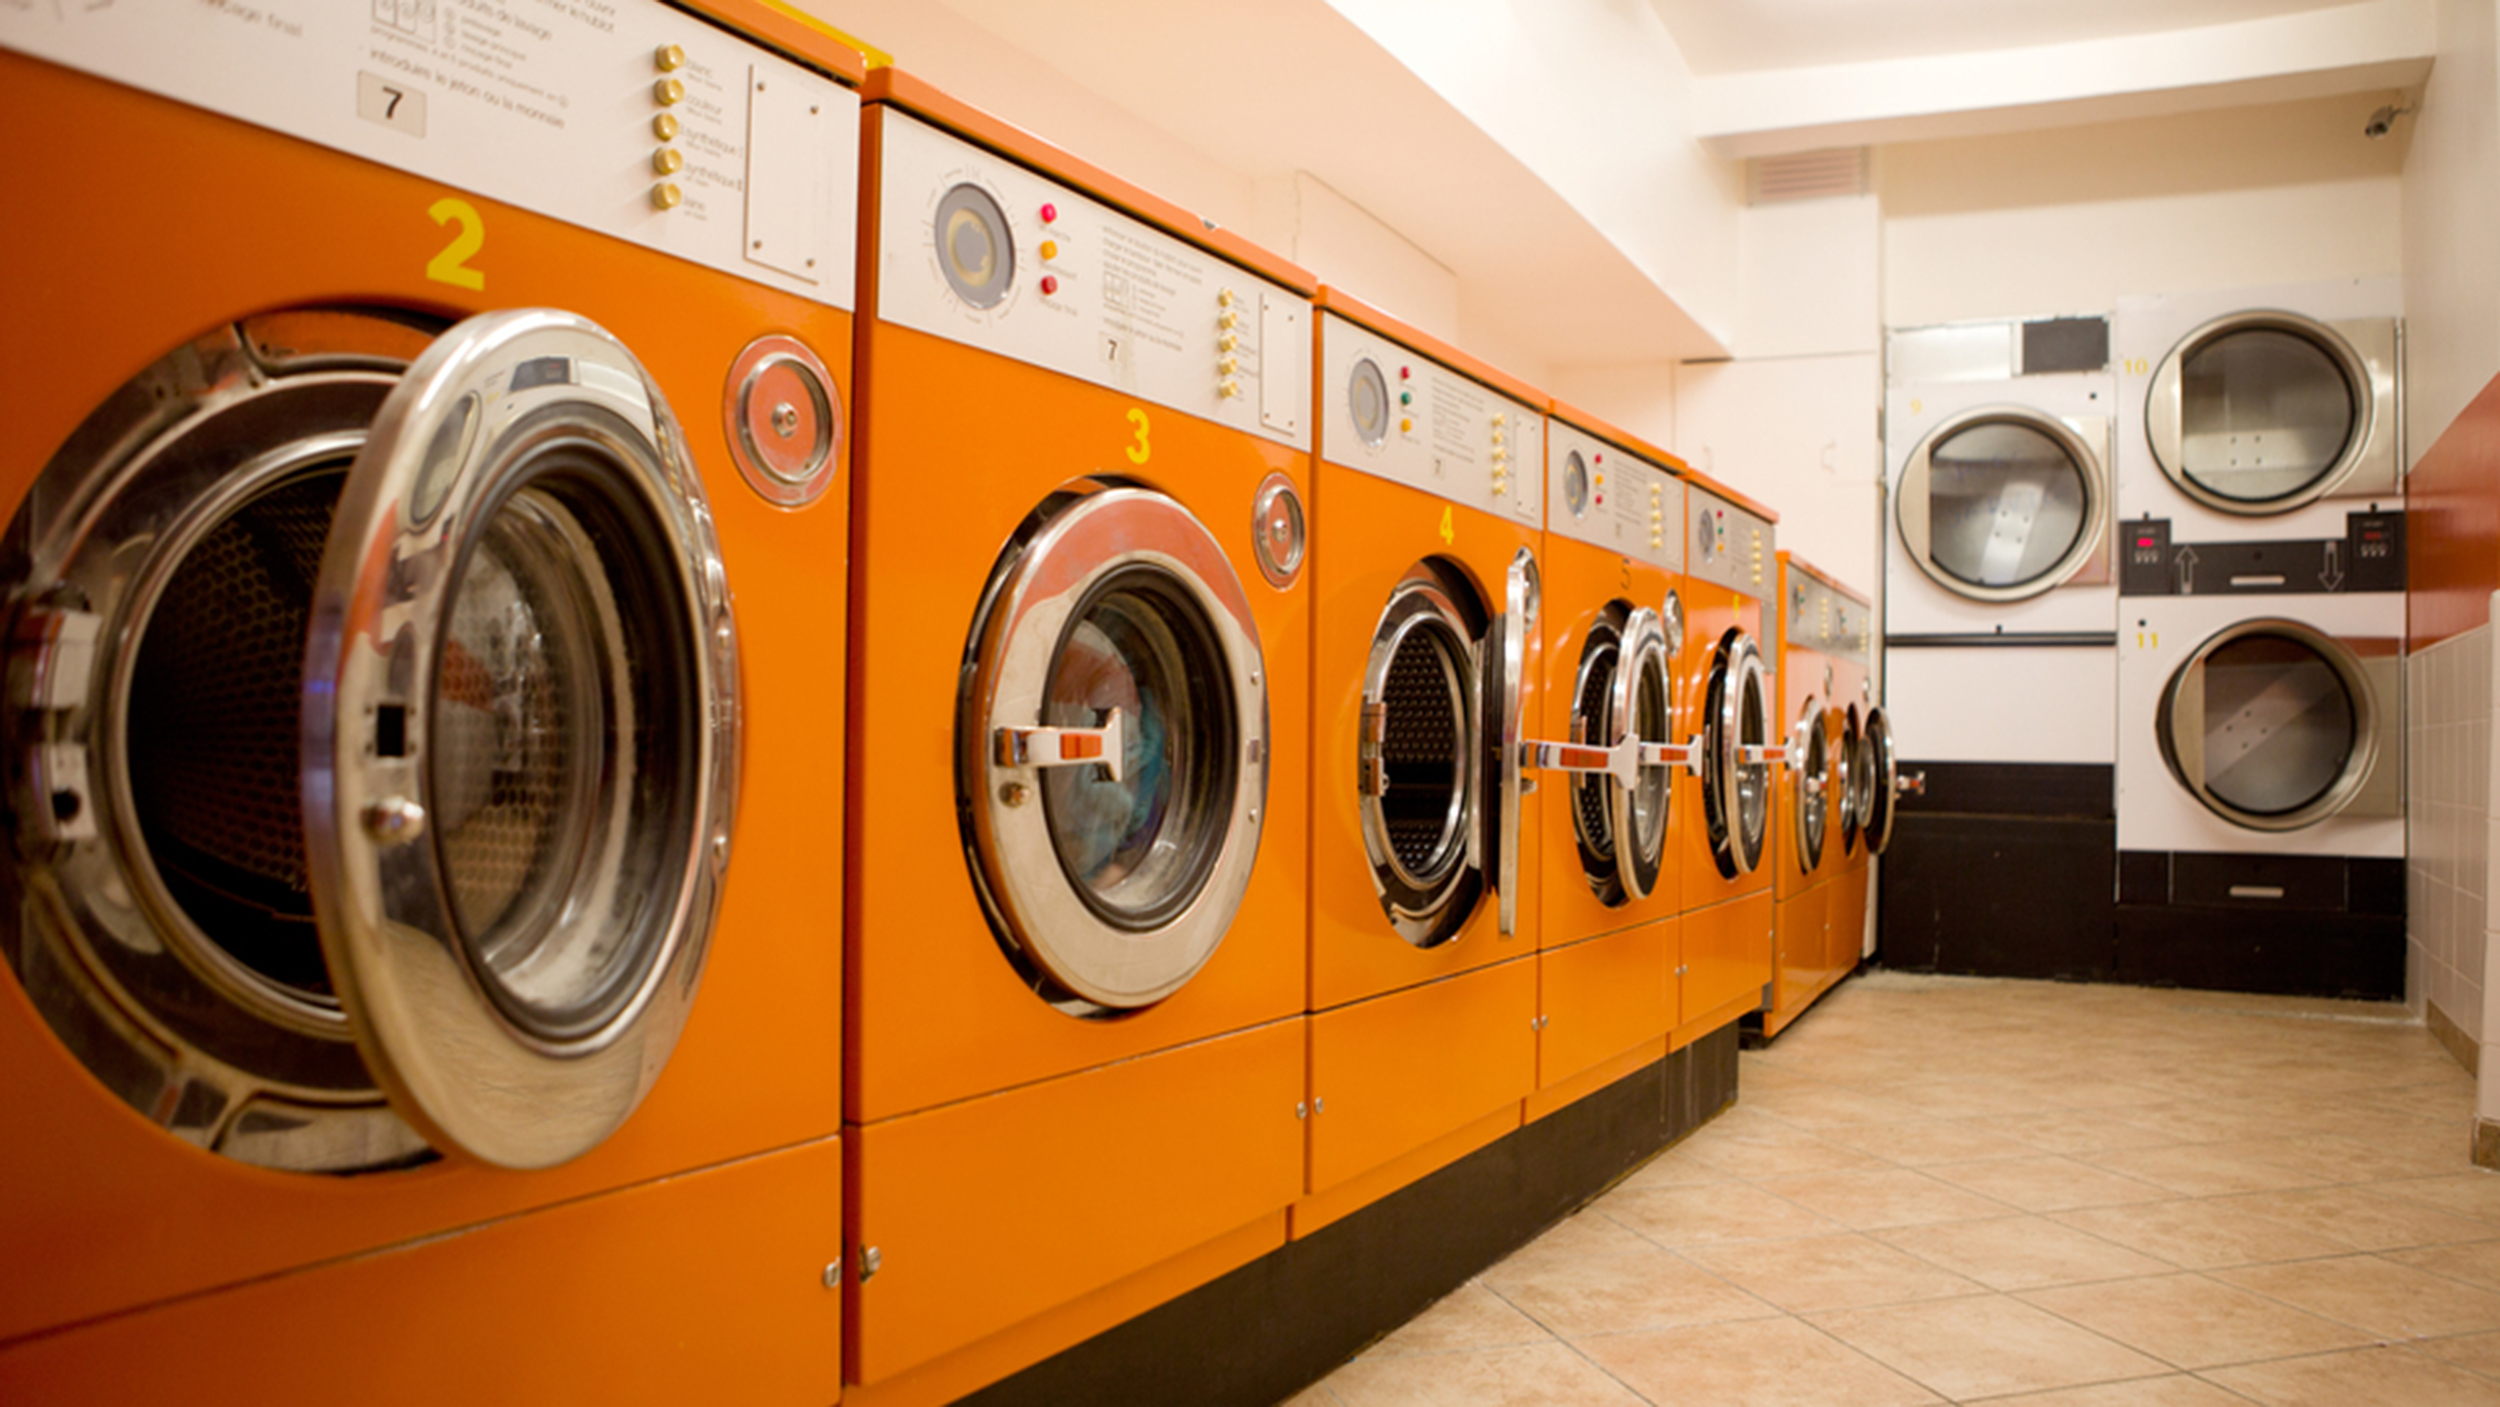 the laundromat - photo #3